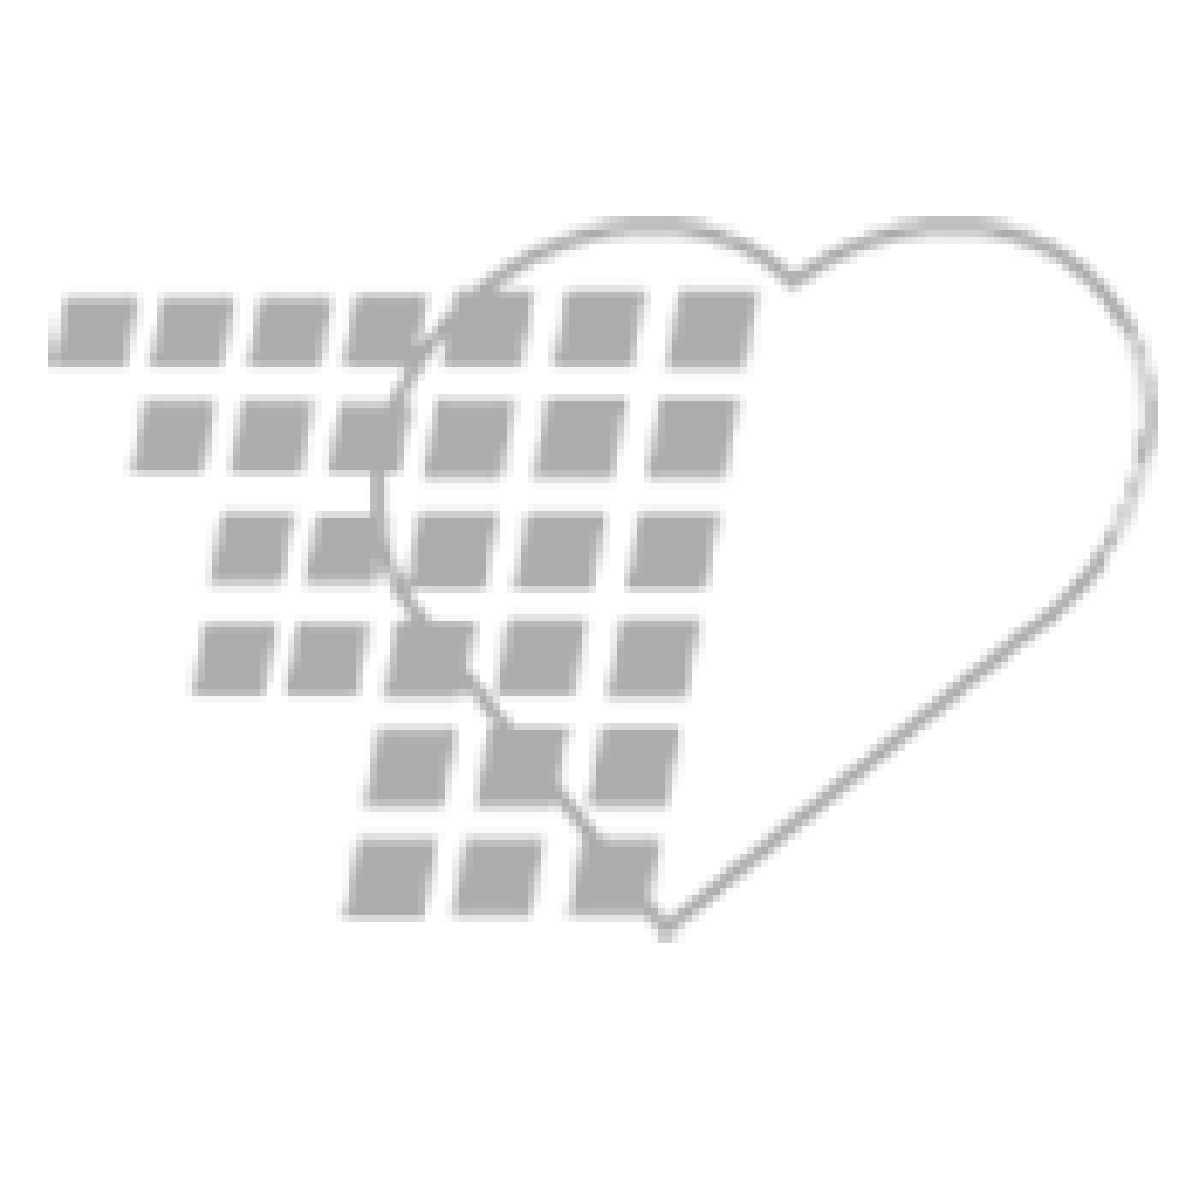 05-68-3135 California Trach Collar (Formerly  Philadelphia)